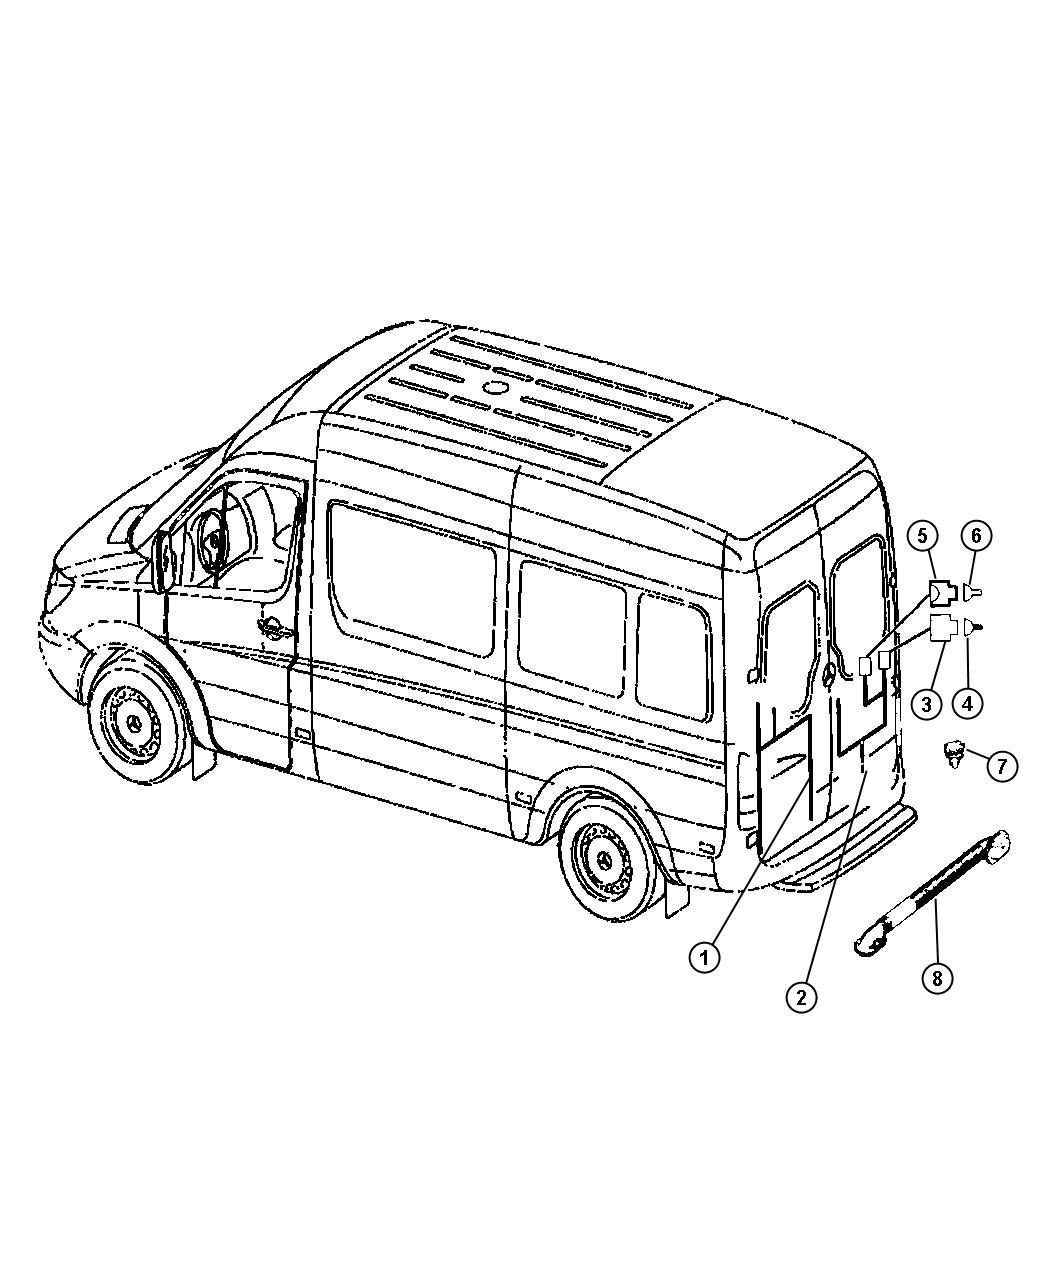 Dodge Sprinter Cover Grommet Wiring